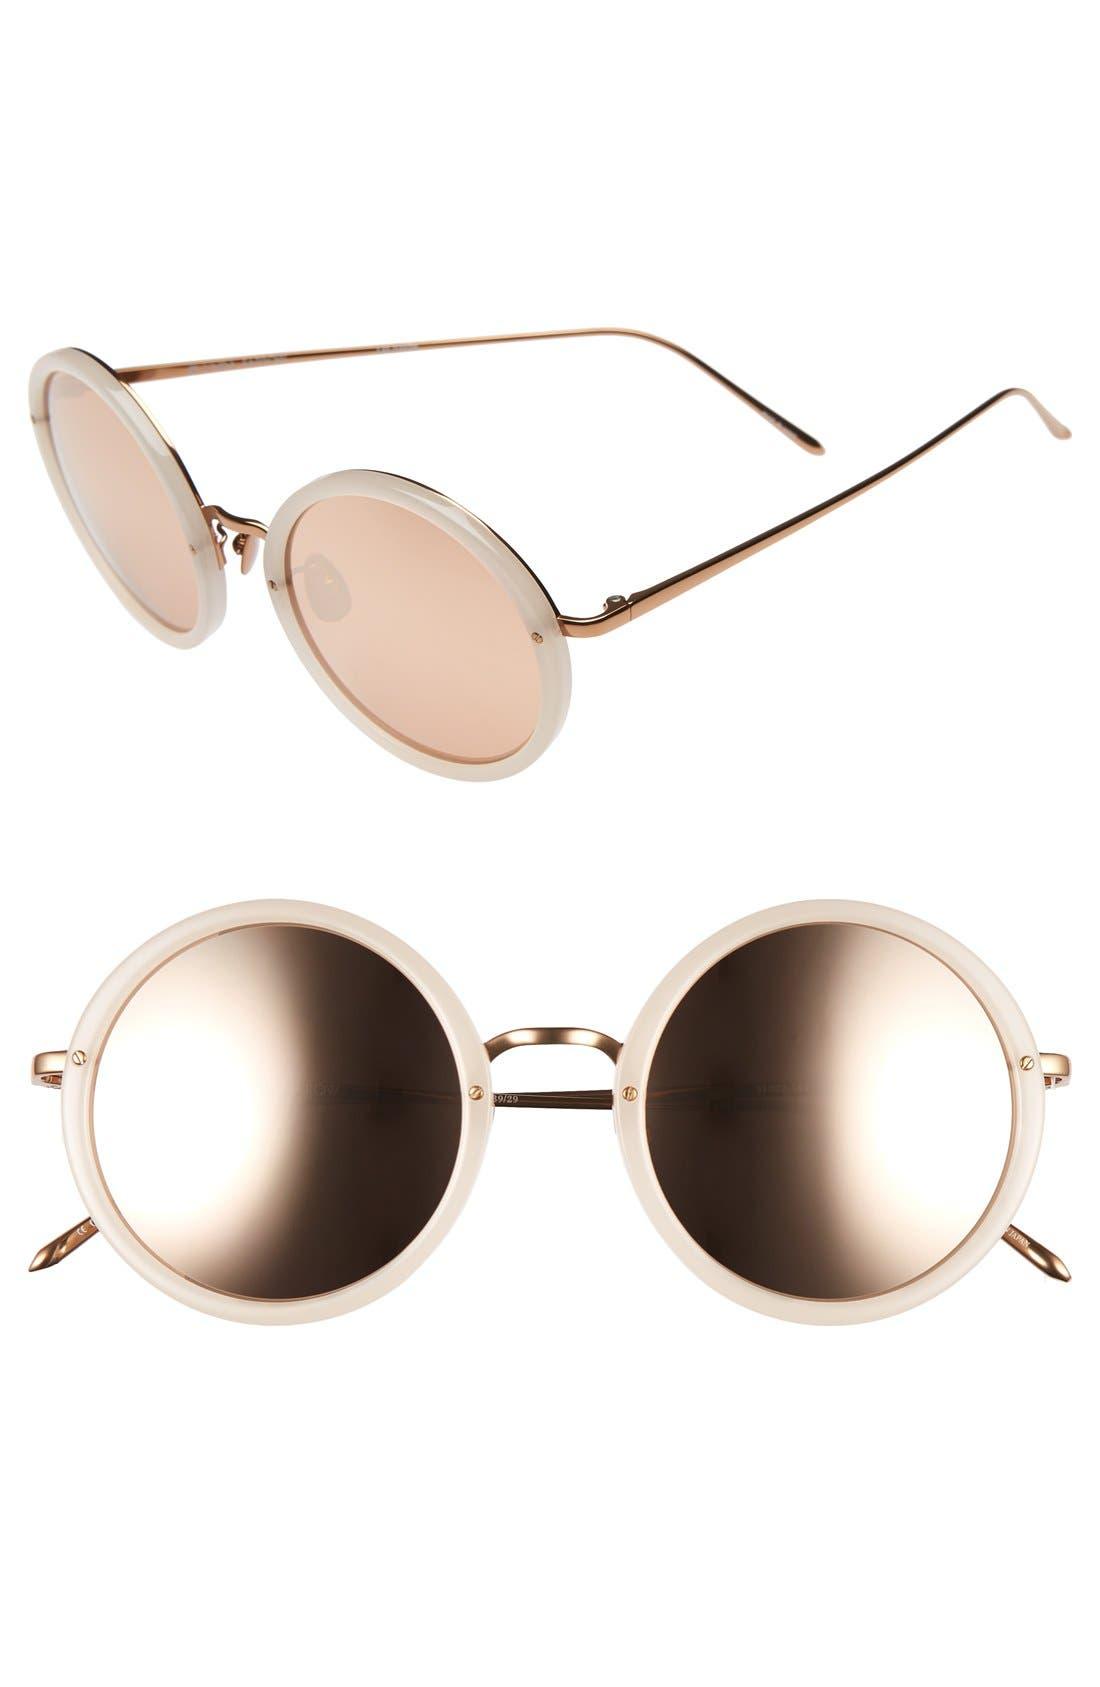 Linda Farrow 51mm Round 18 Karat Rose Gold Trim Sunglasses